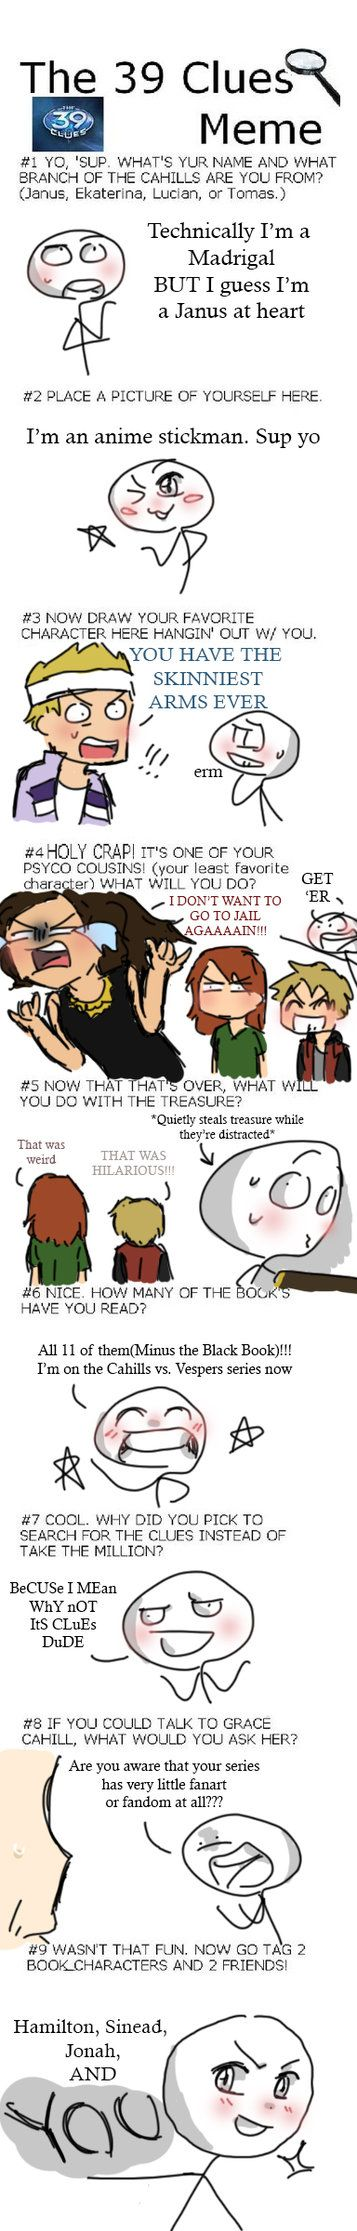 Meme By Myoni52 Memes The 39 Clues Family Problems